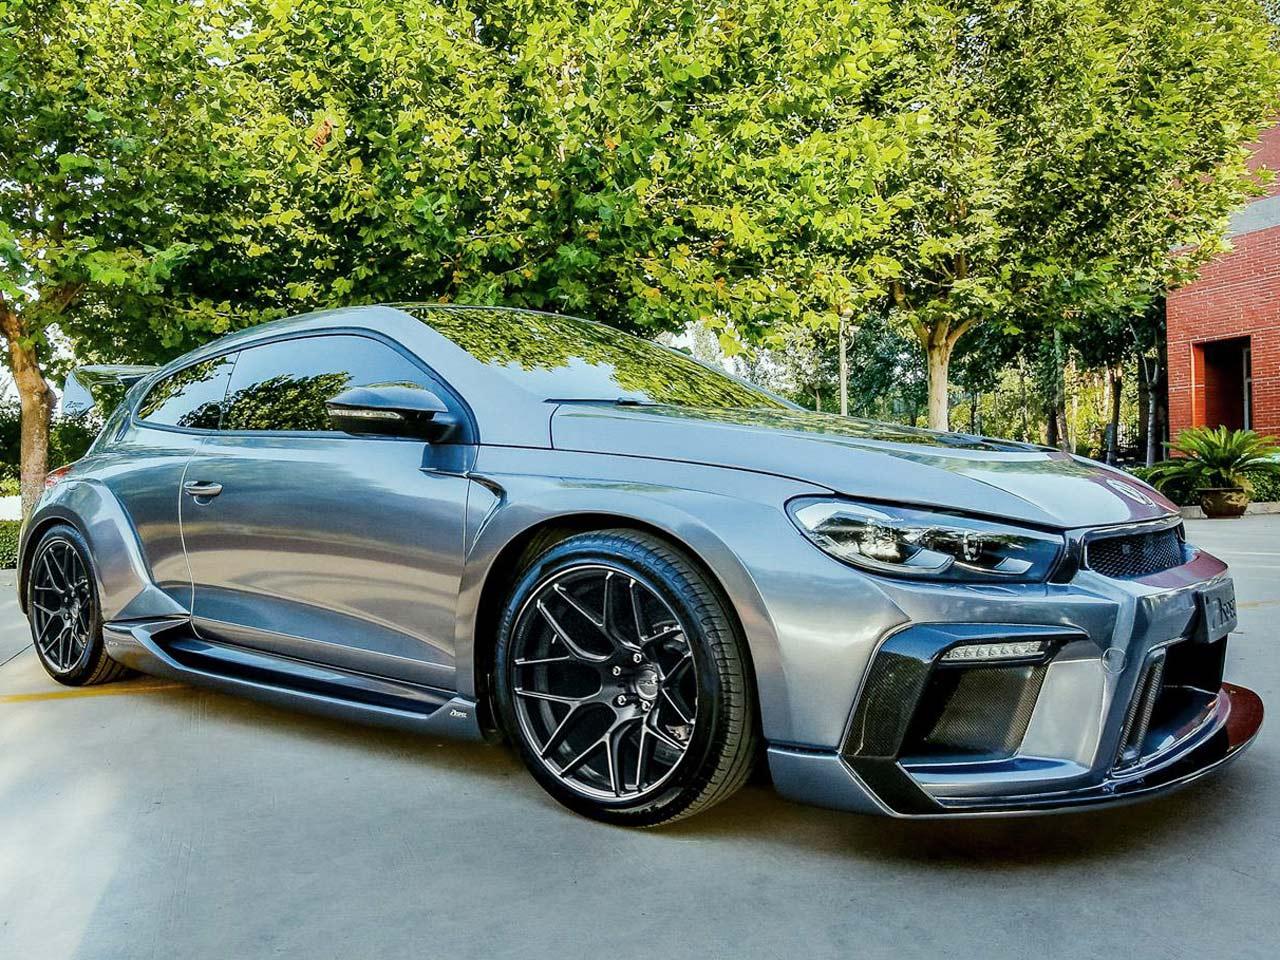 Vw Golf Gti Performance 2017 >> VW Scirocco R: Tuning von Aspec | autozeitung.de